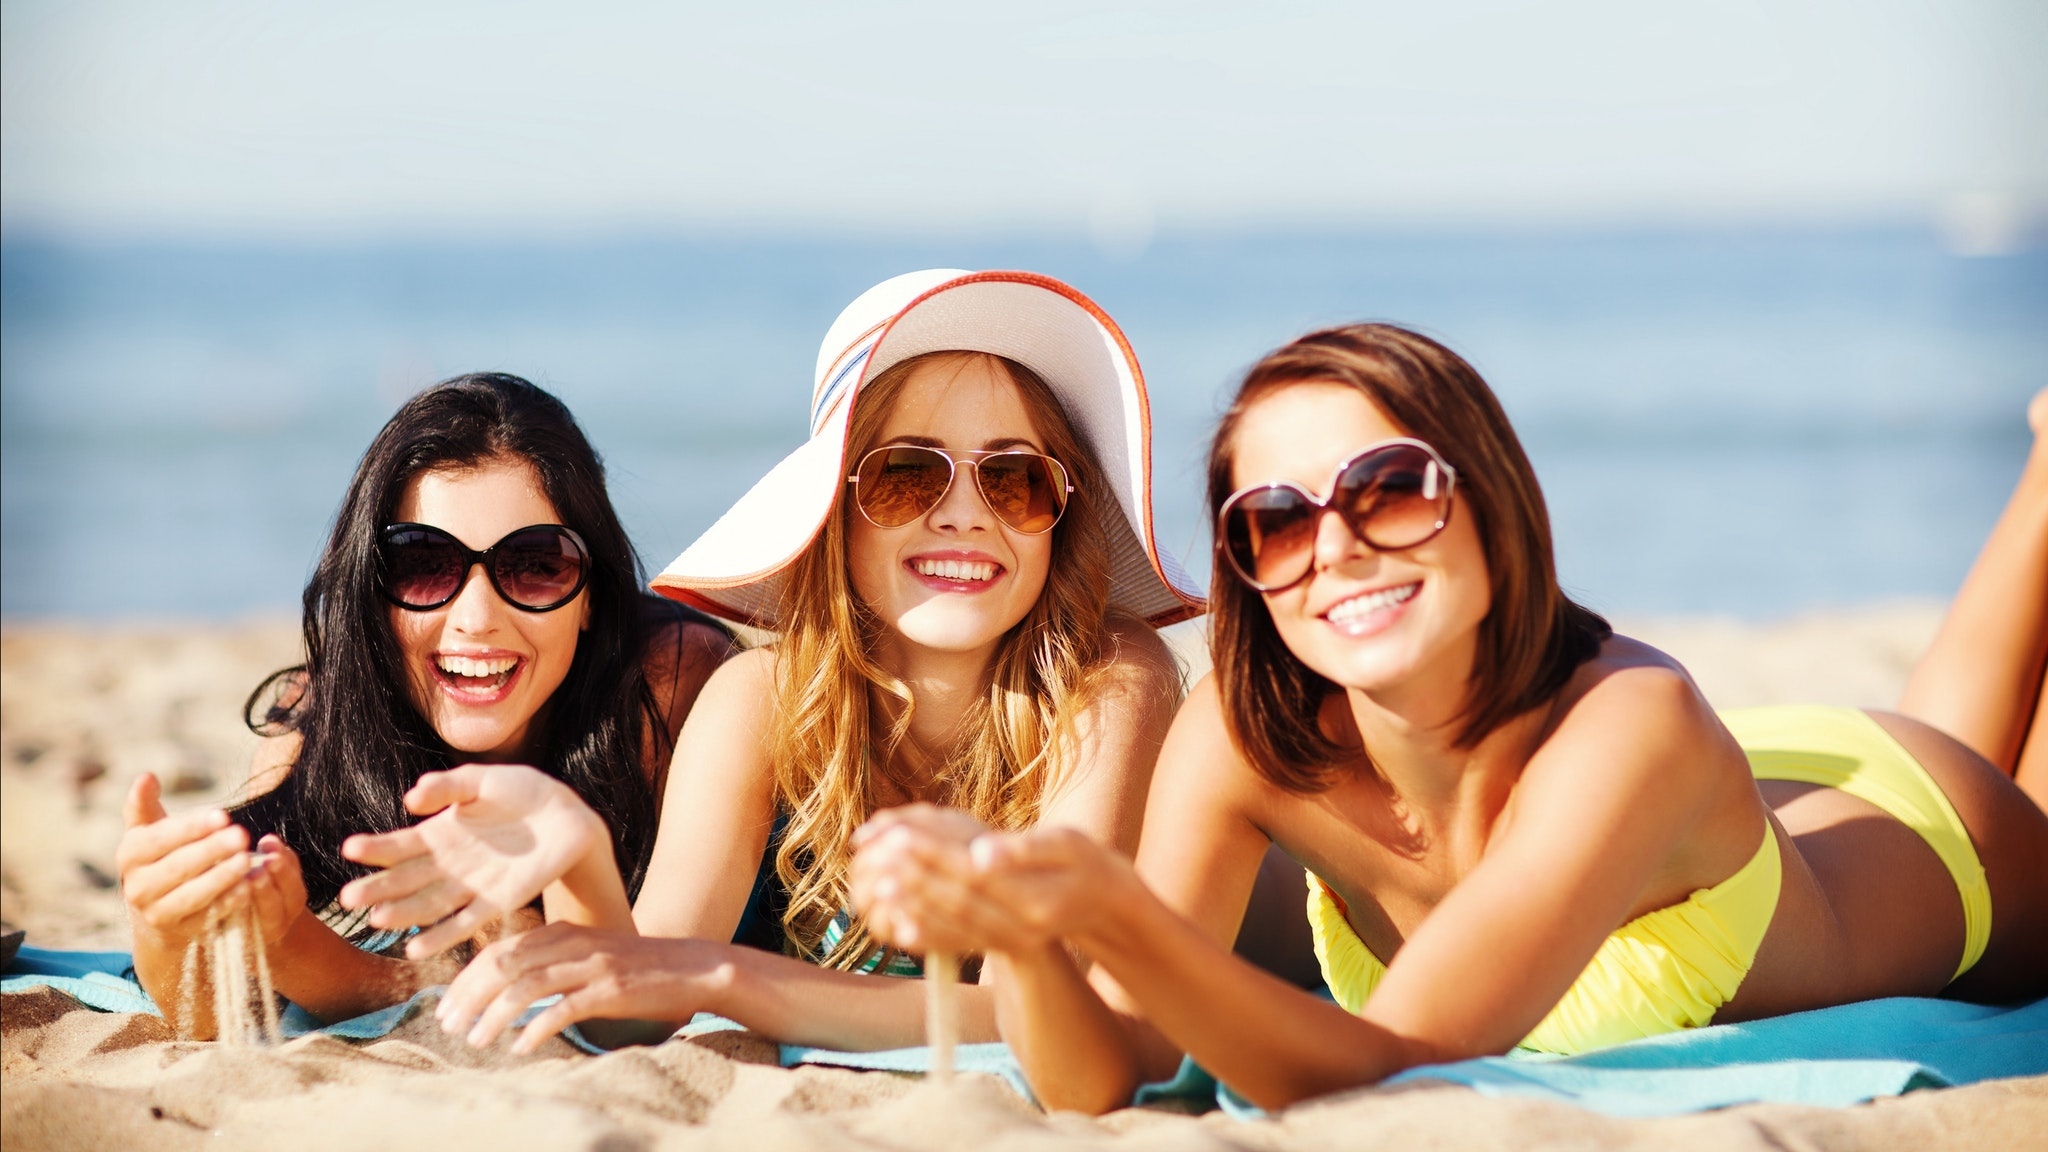 Three happy girls on the beach